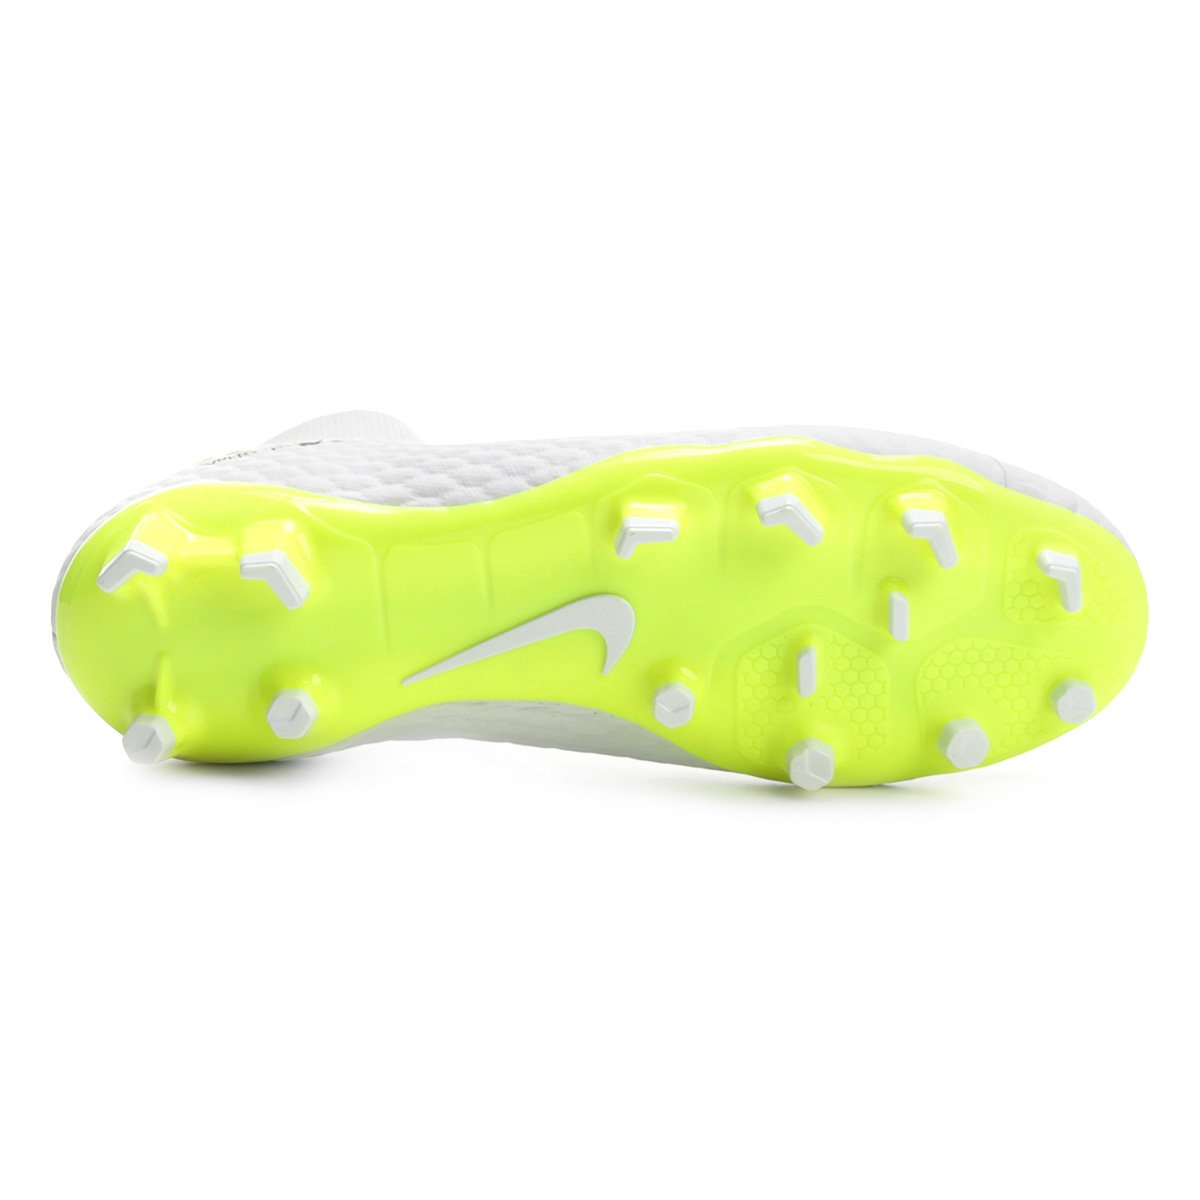 Chuteira Campo Nike Hypervenom Phantom 3 Academy DF FG - Branco e ... a81598081bcd6